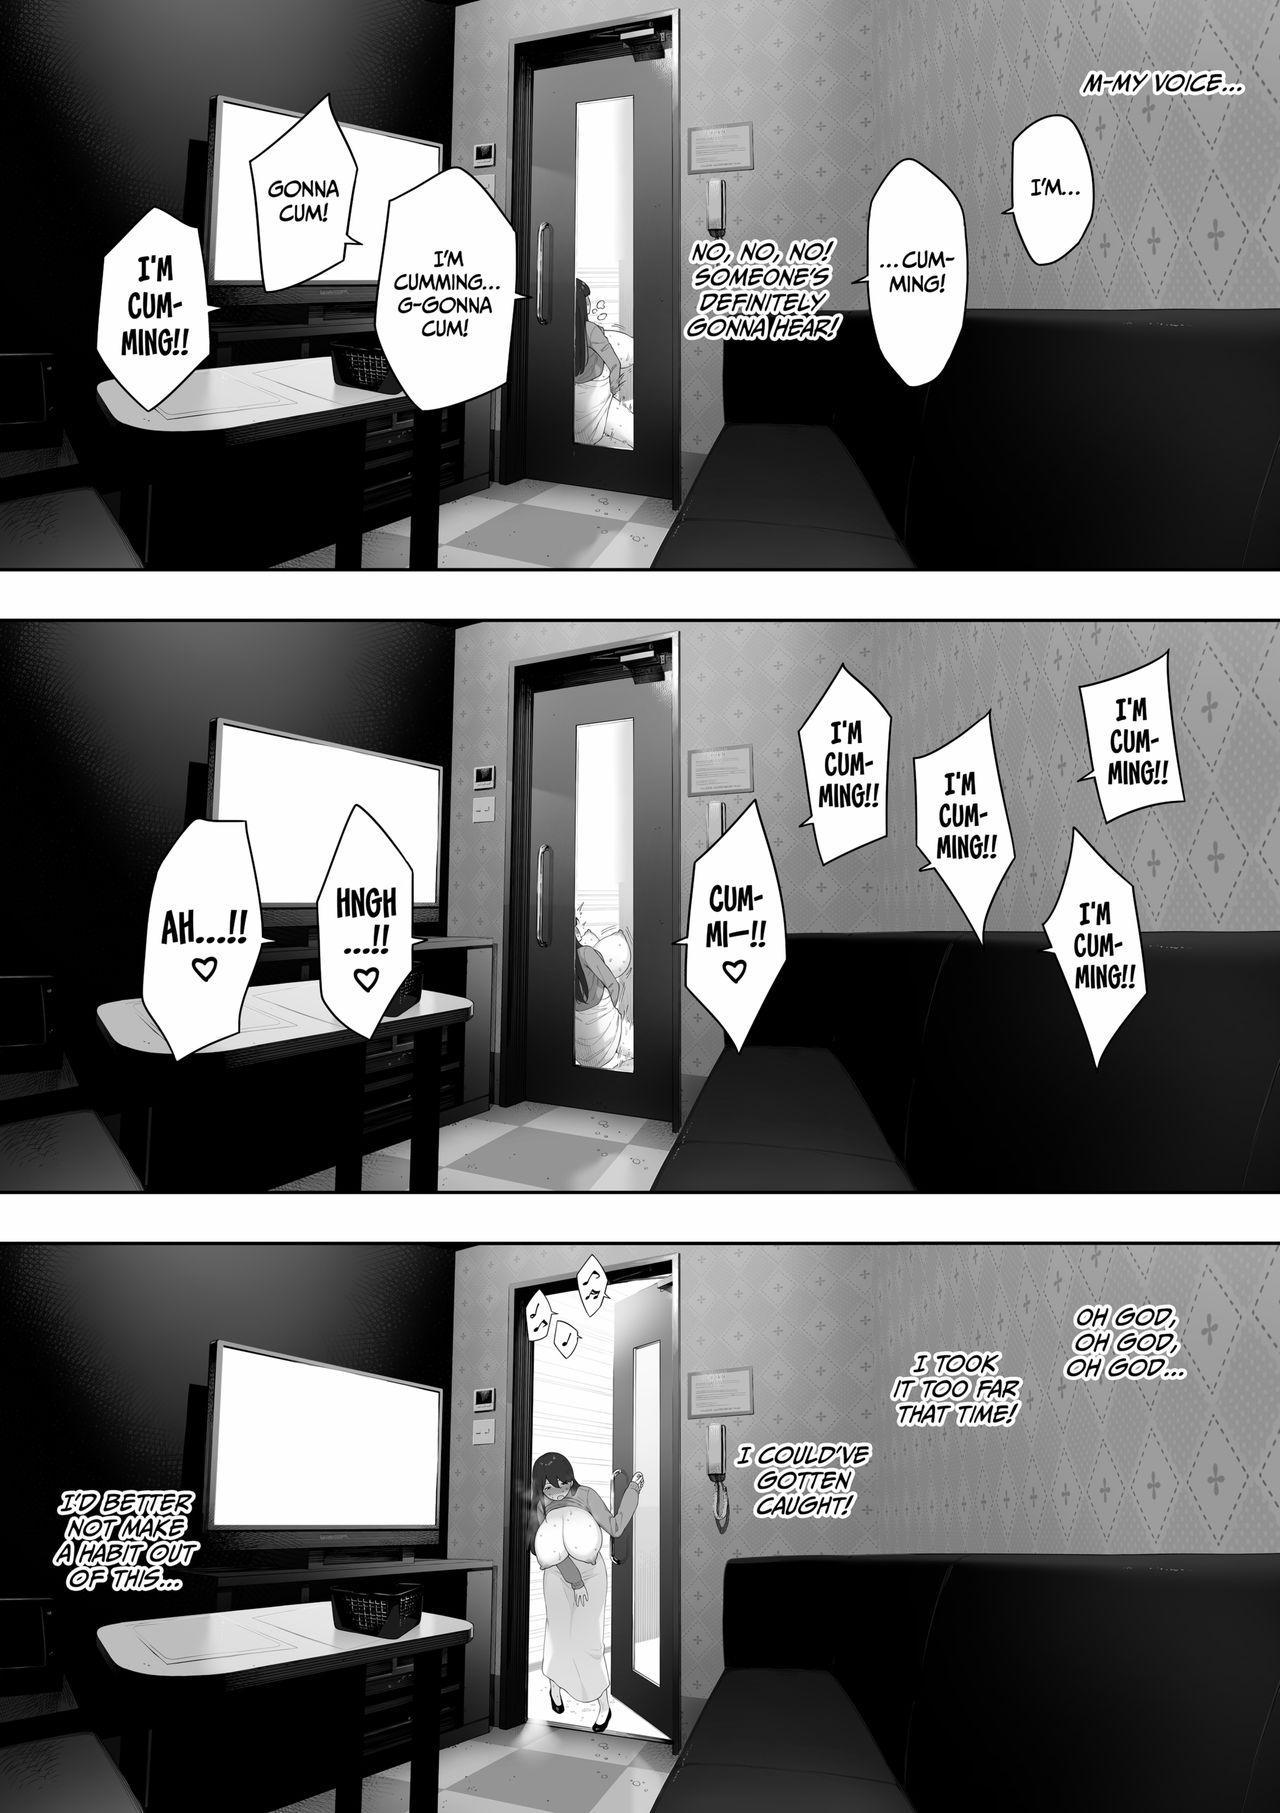 [NT Labo (NT Robo)] Aisai, Doui no Ue, Netorare Roshutsu | [NT Labo(NT Robo)] Cucked With_My Consent My Exhibitionist Wife [English] 7